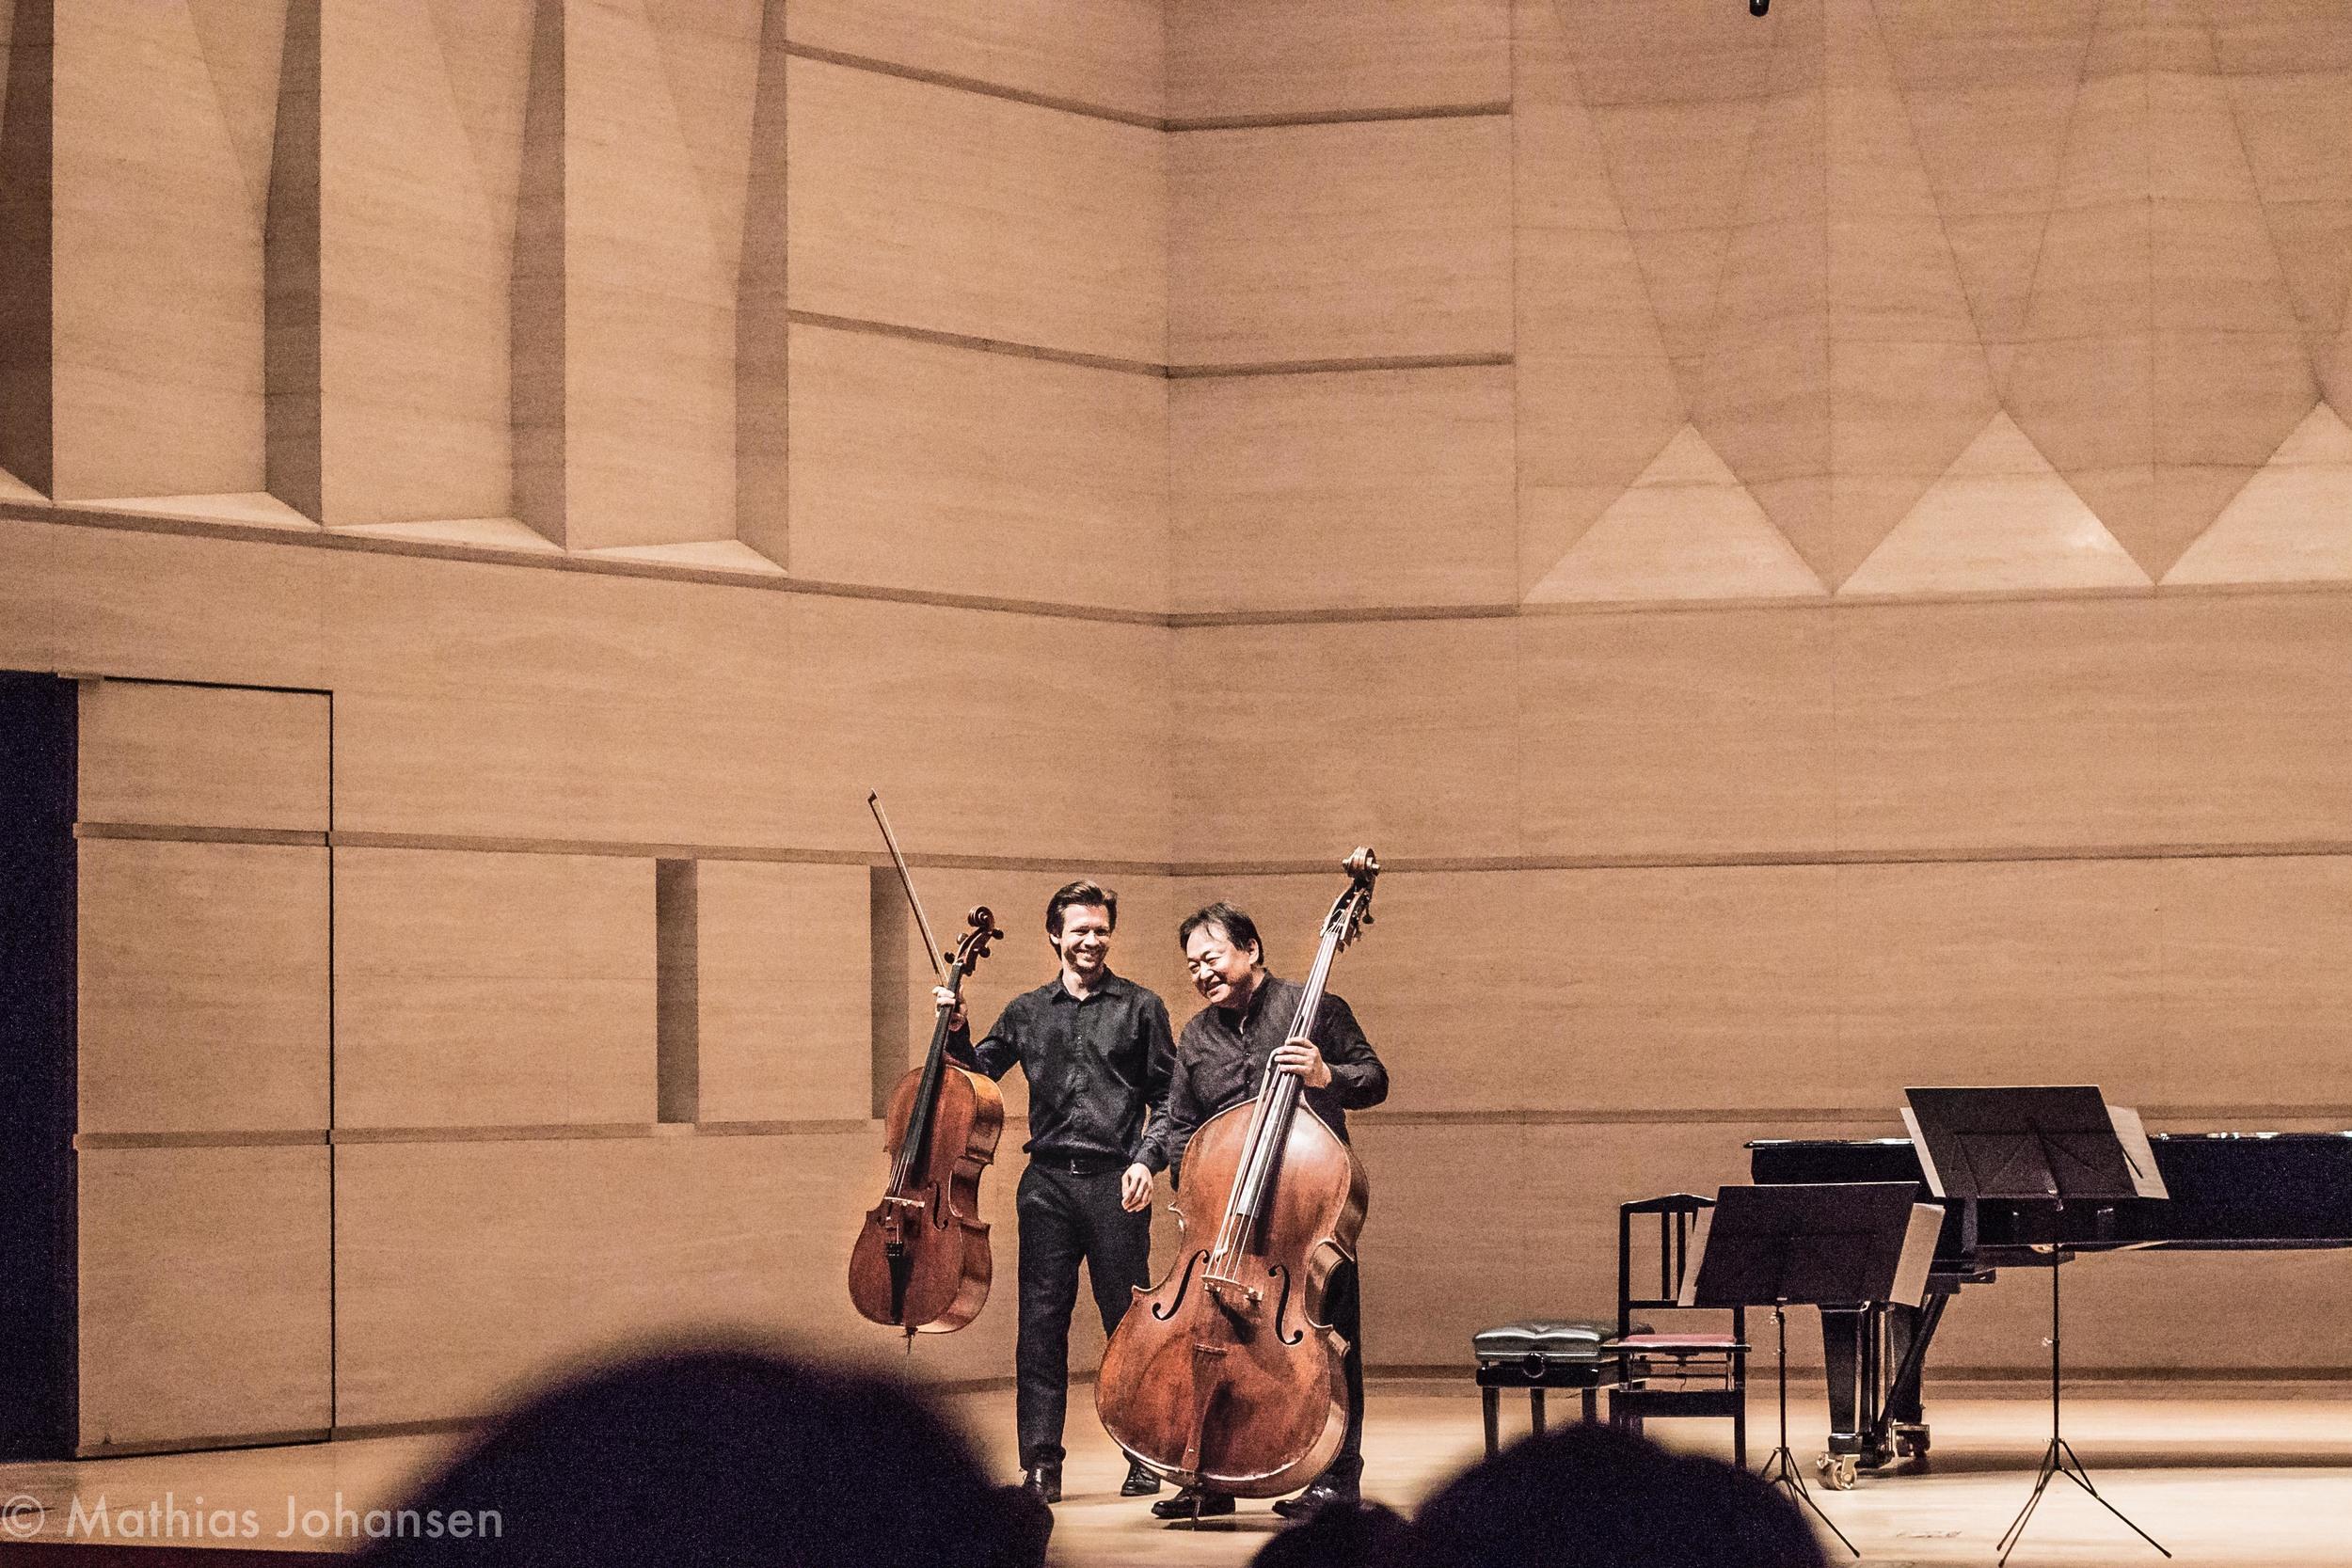 Masters Concert in Nagoya #3